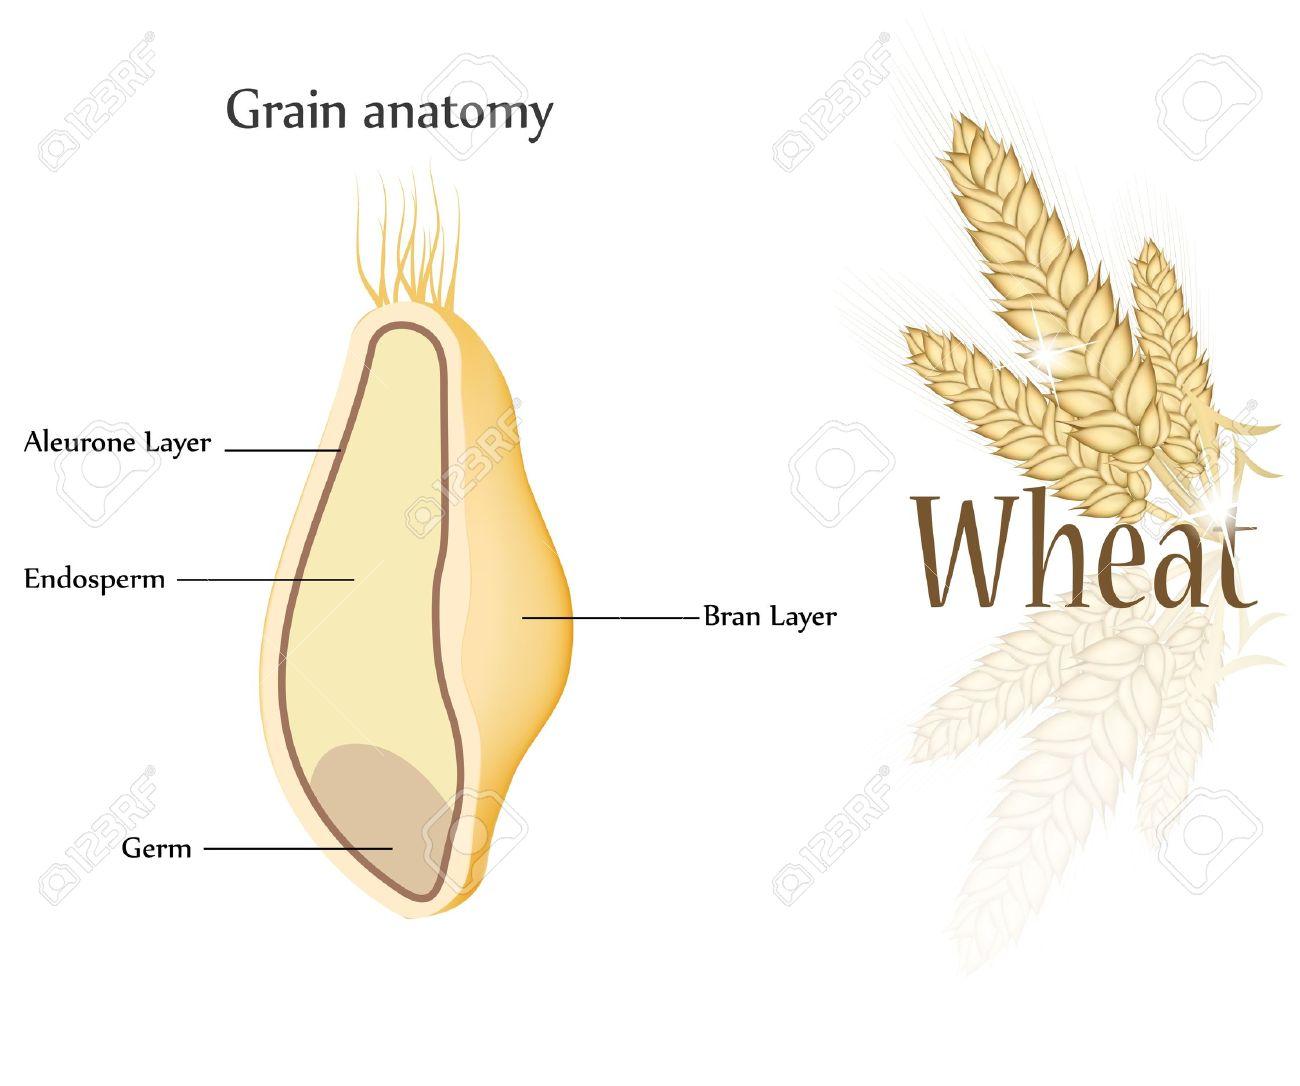 Wheat And Grain Anatomy. Cross Section Of Grain. Endosperm, Aleurone ...